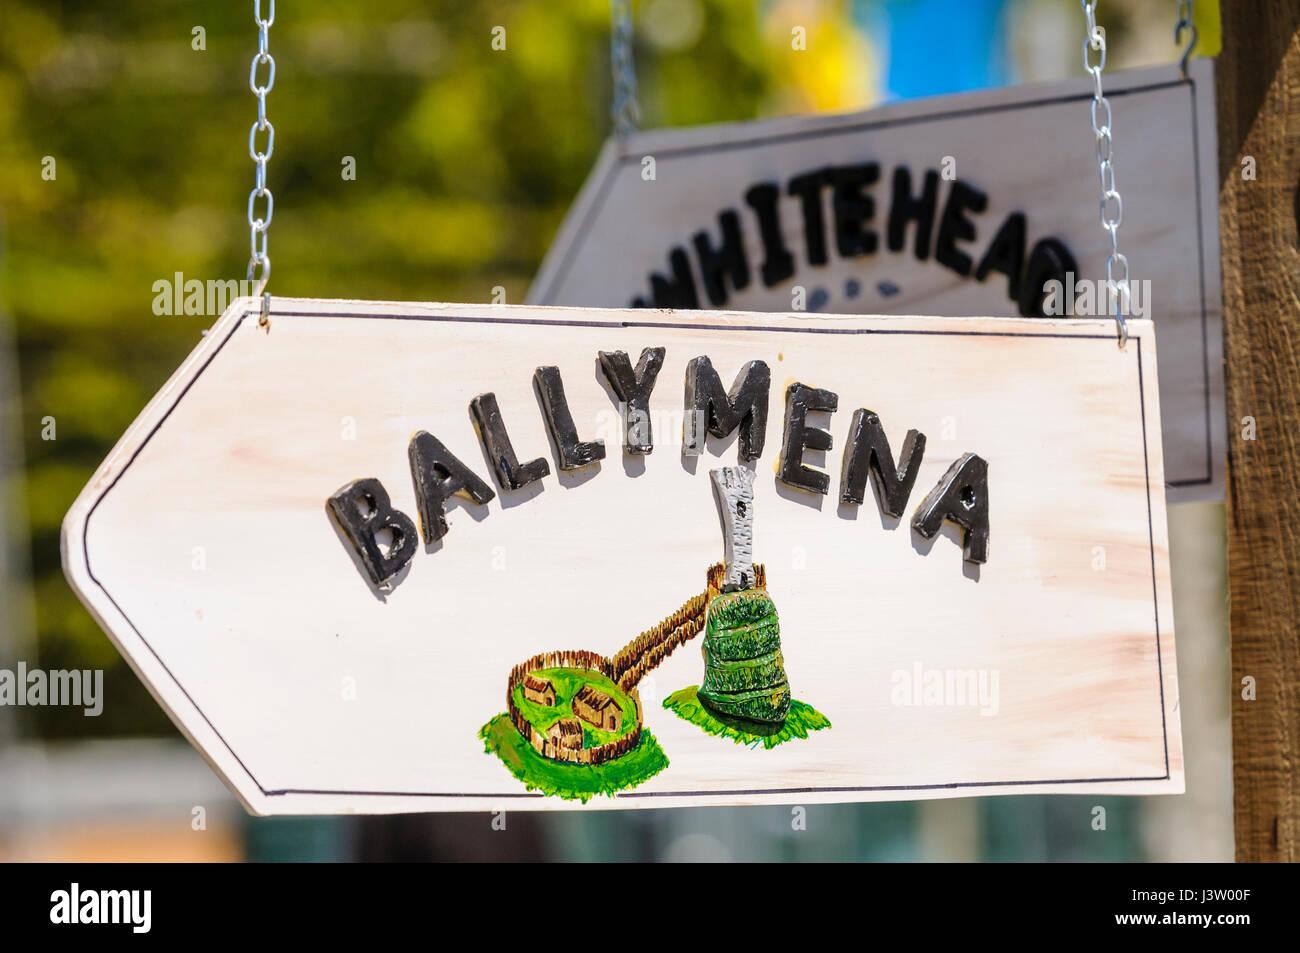 Handmade garden Direction sign to Ballymena, Northern Ireland - Stock Image